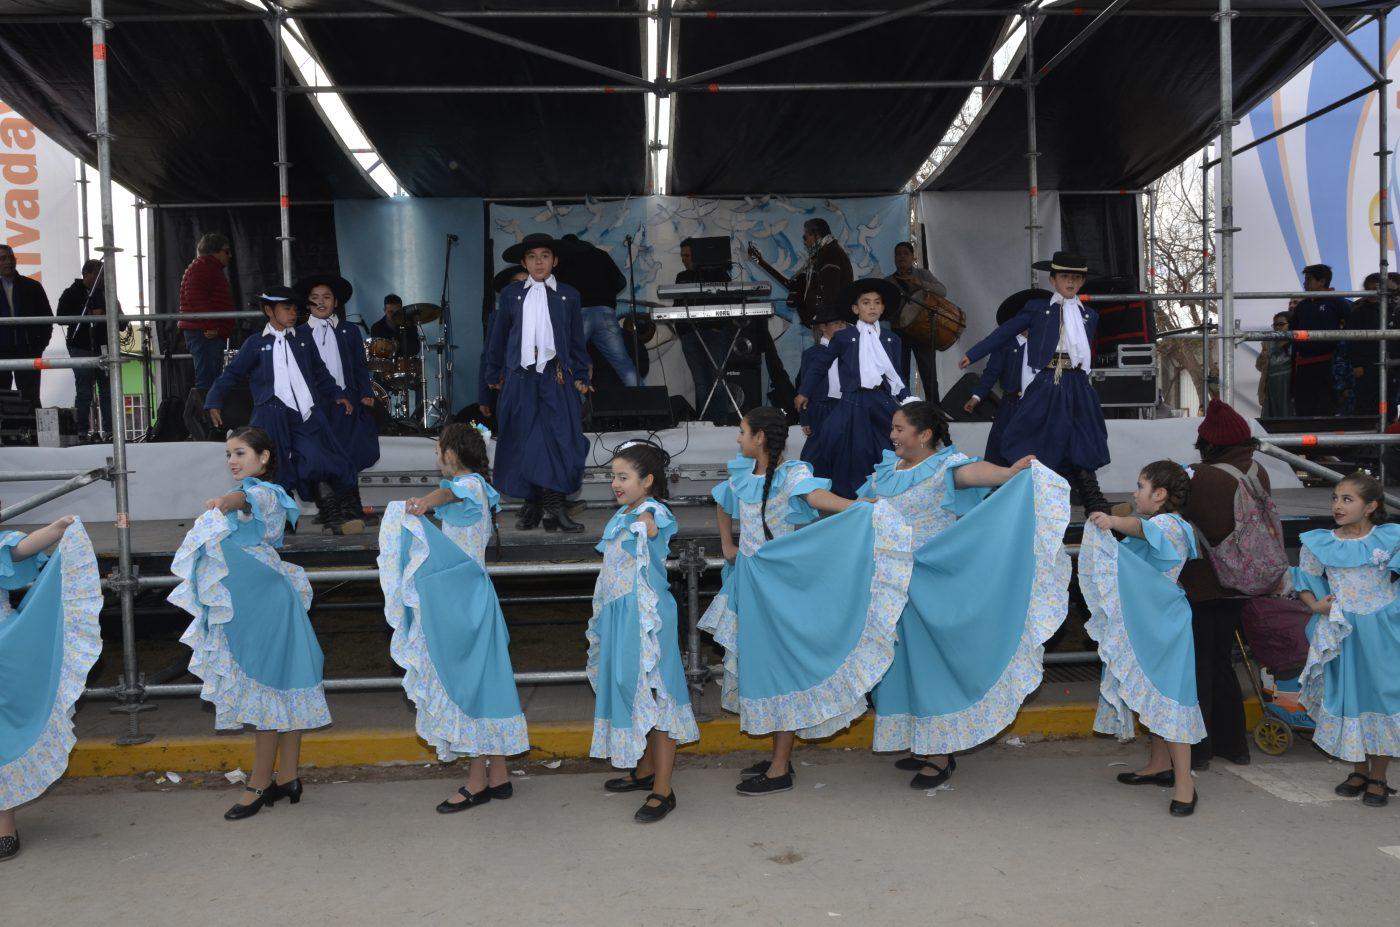 9 de julio en Rivadavia